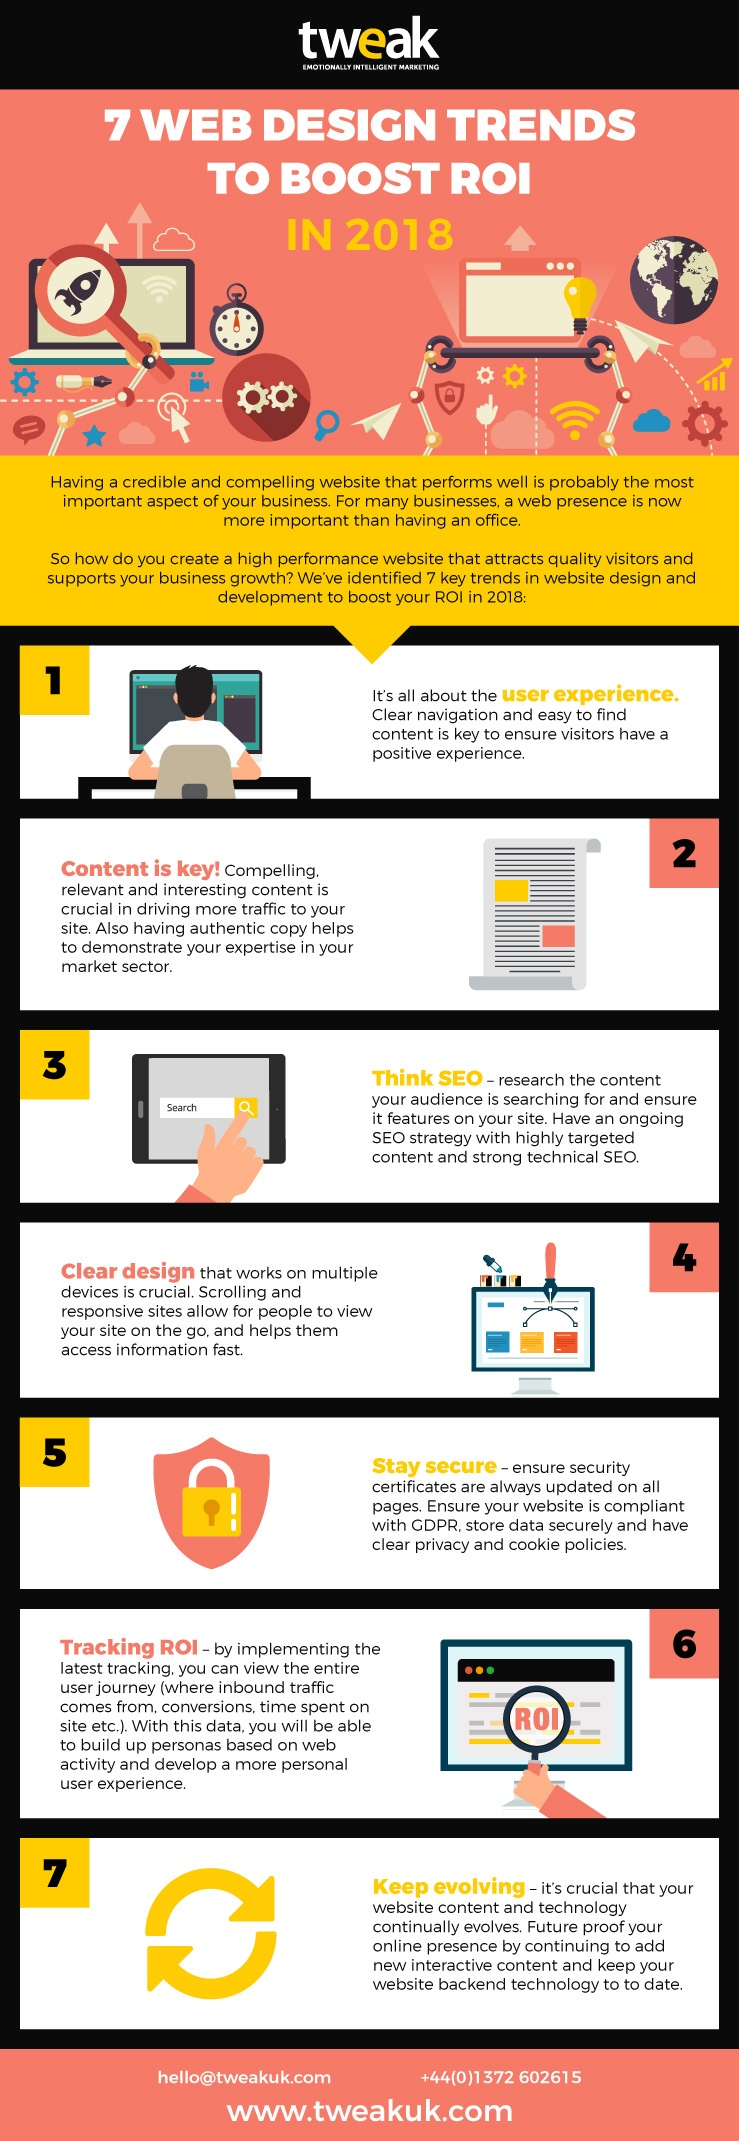 7 Web Design Trends to Boost ROI in 2018